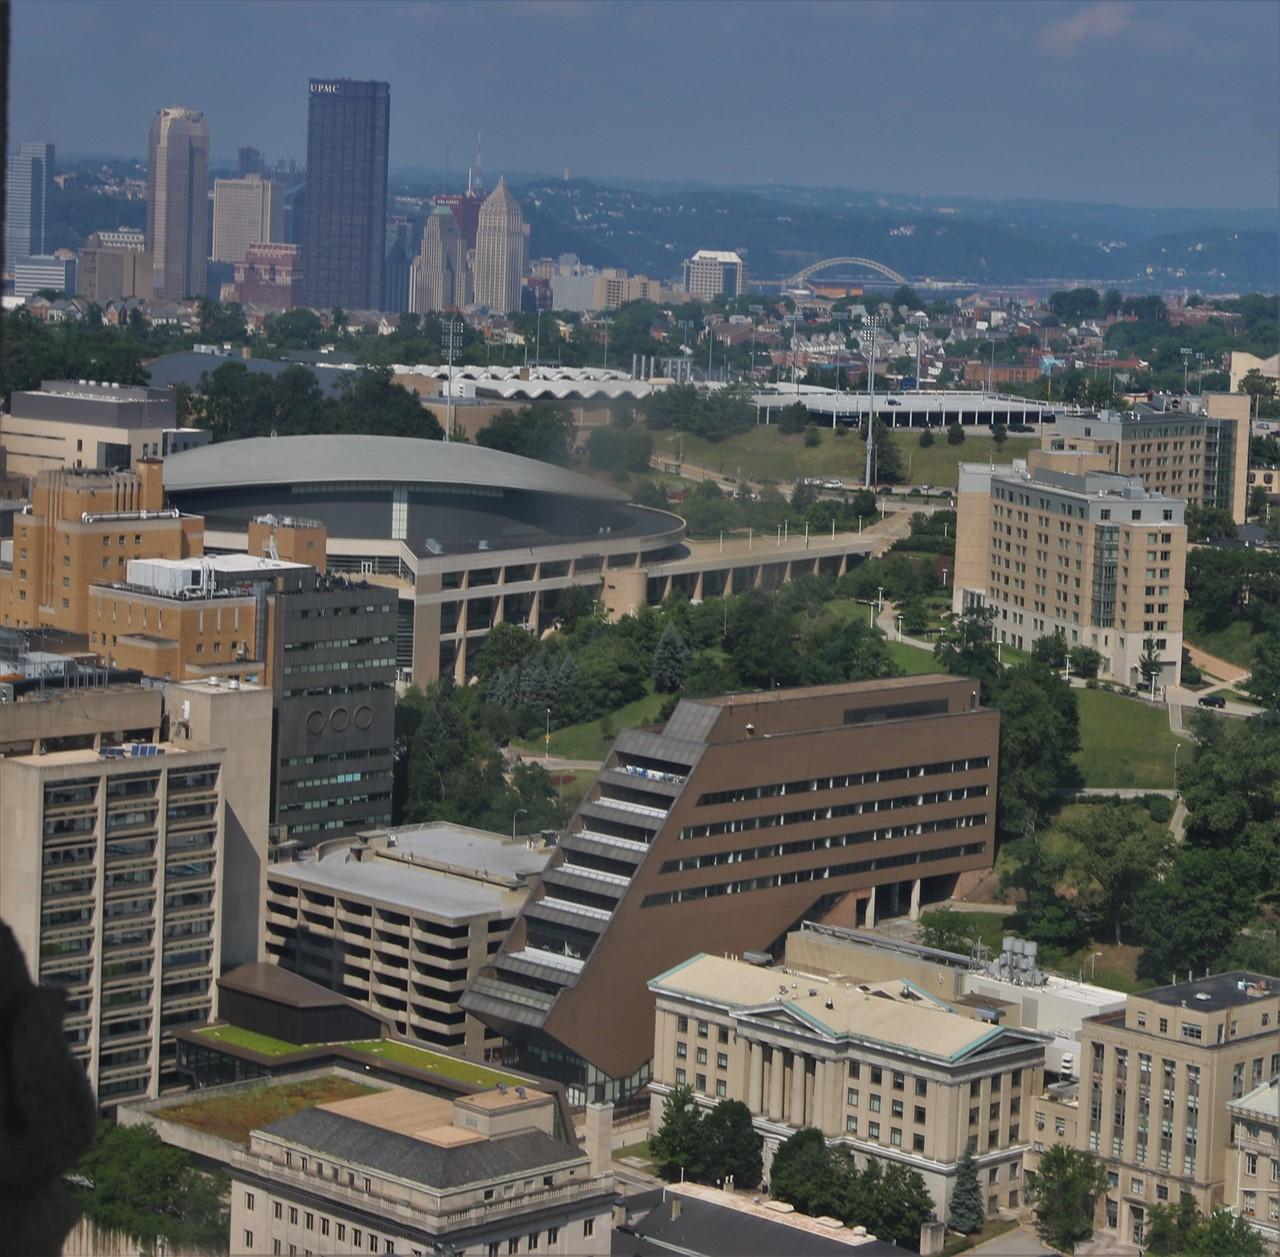 2016 06 25 9 Pittsburgh.jpg